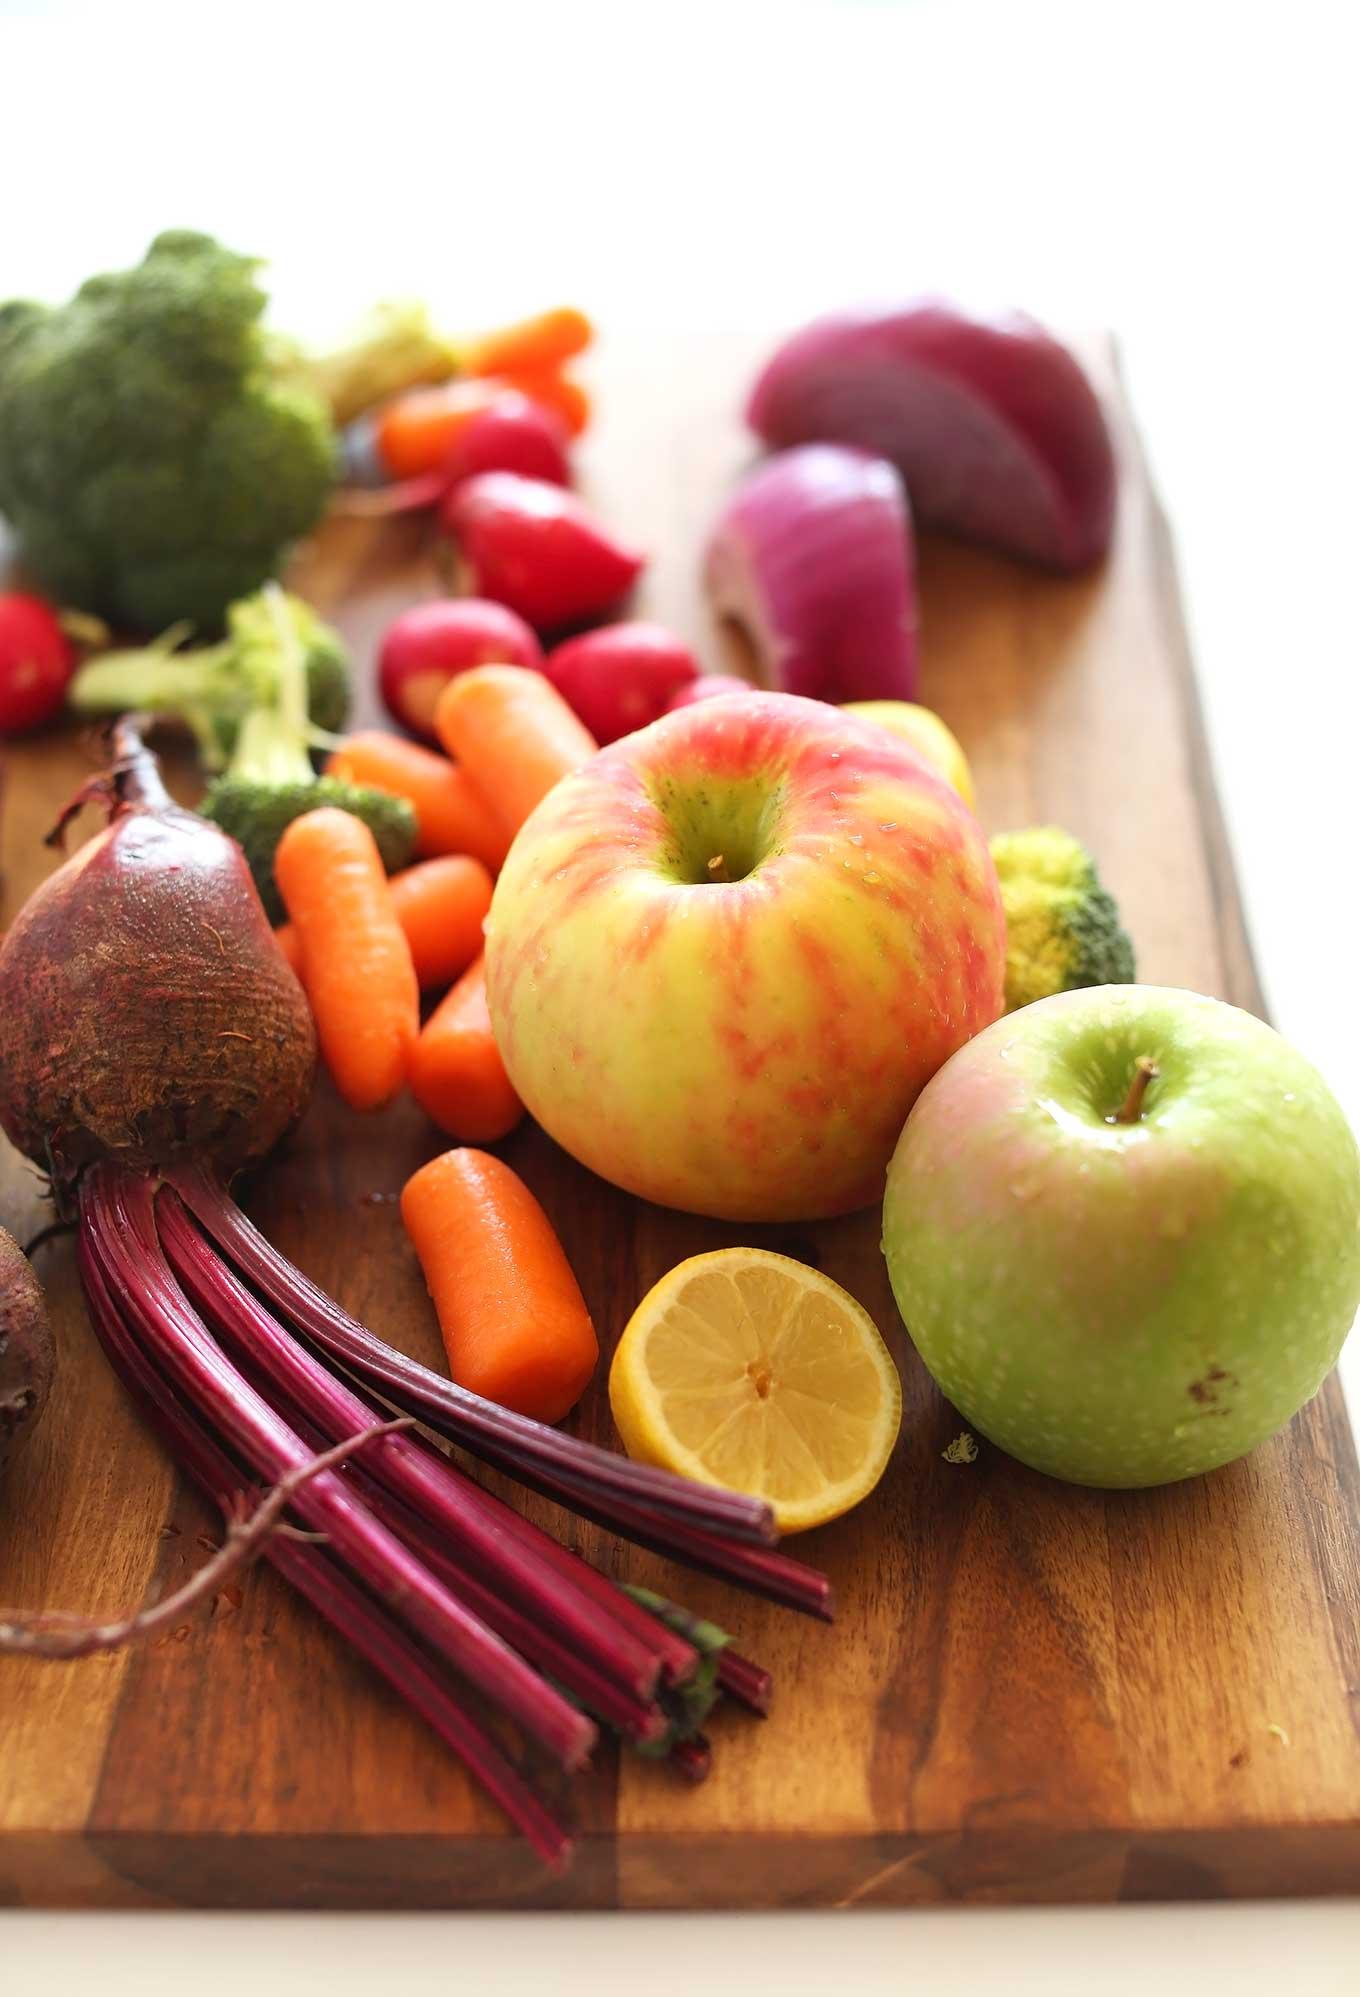 Fresh apples, carrots, beets, broccoli, radish, onions, and lemon for making a healthy fall slaw